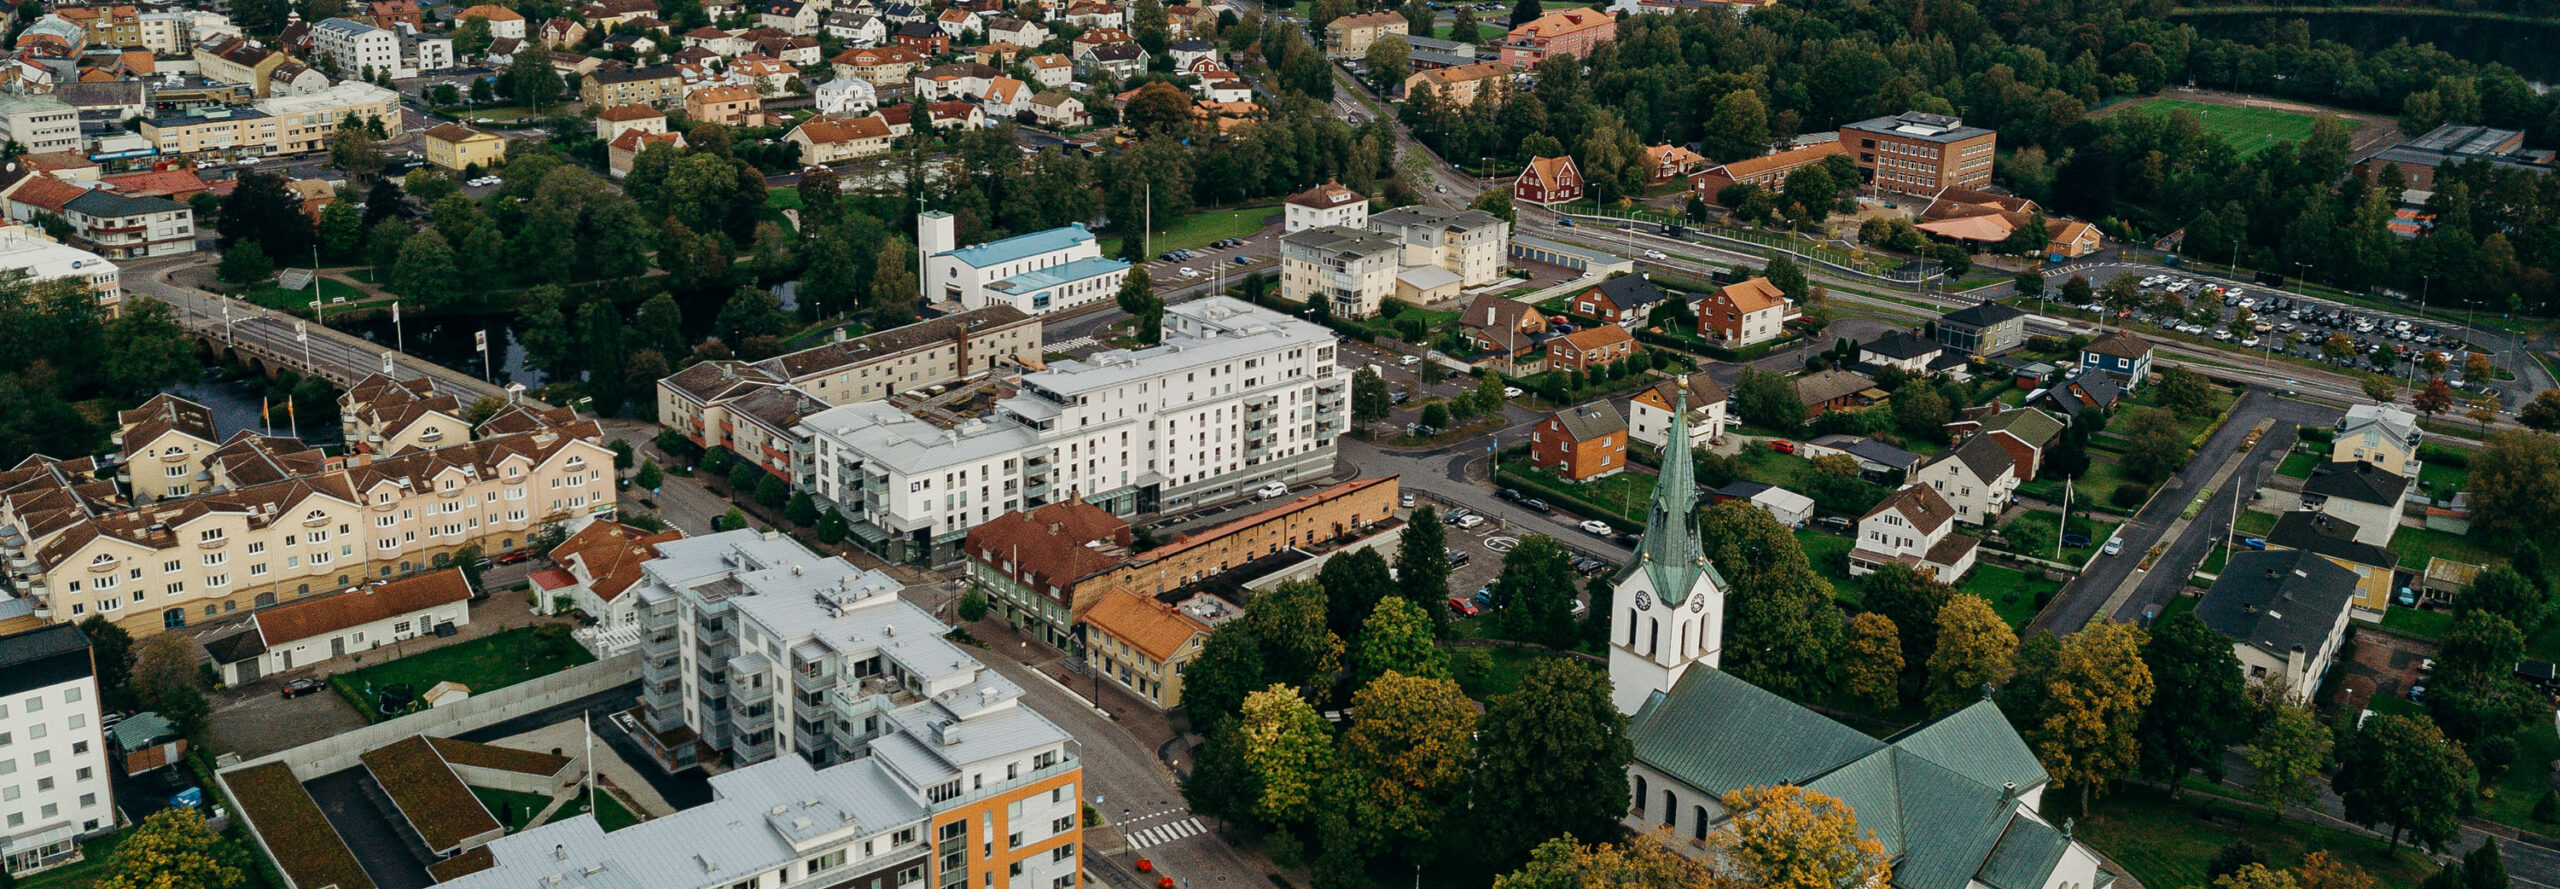 ComCenter öppnar i Värnamo